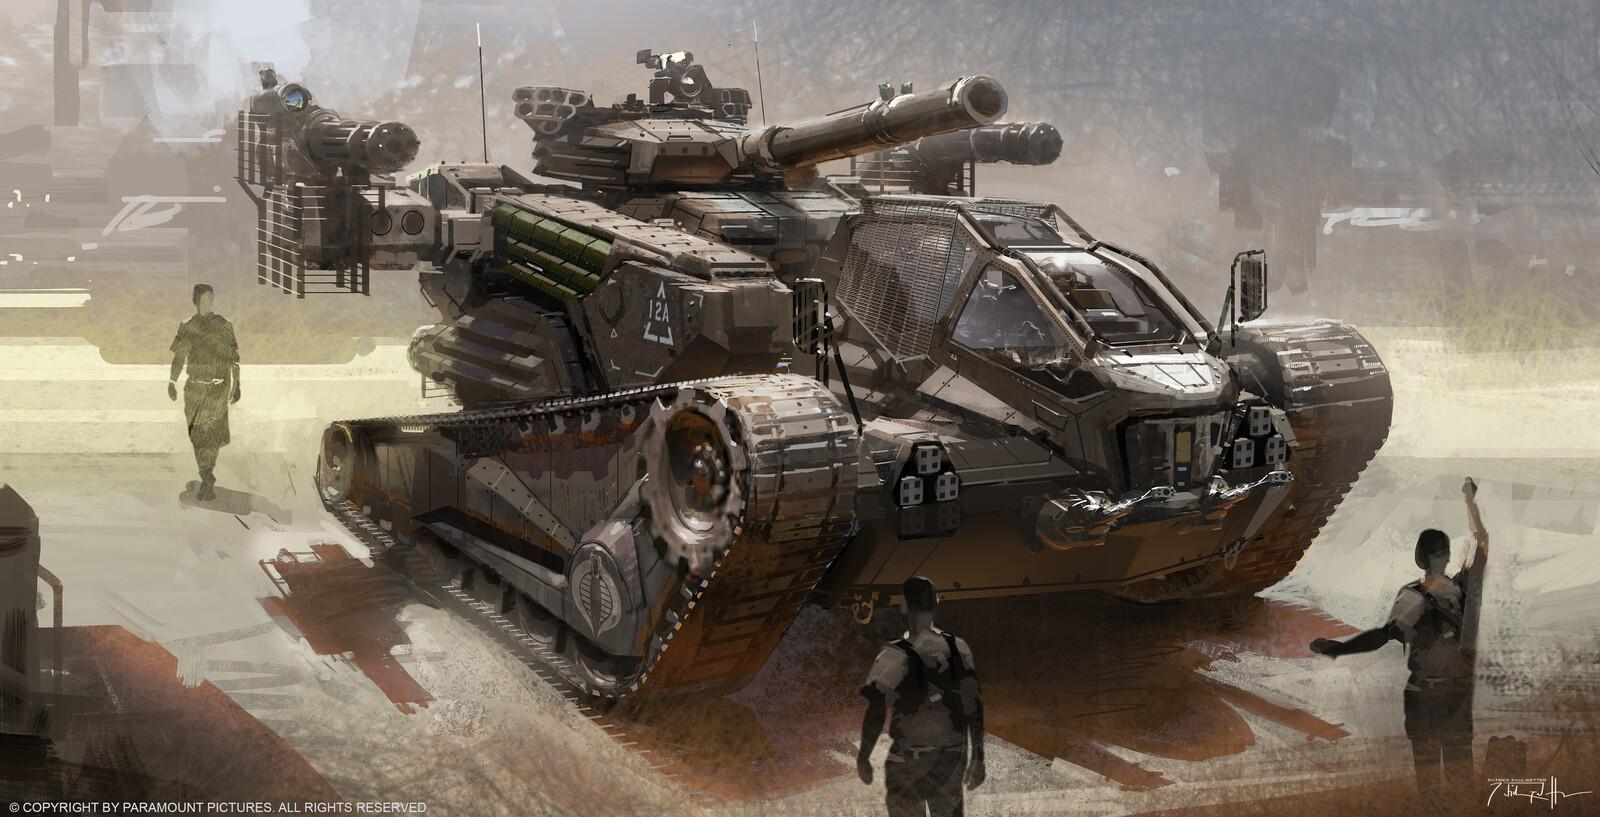 GI Joe Retaliation HISS tank concept